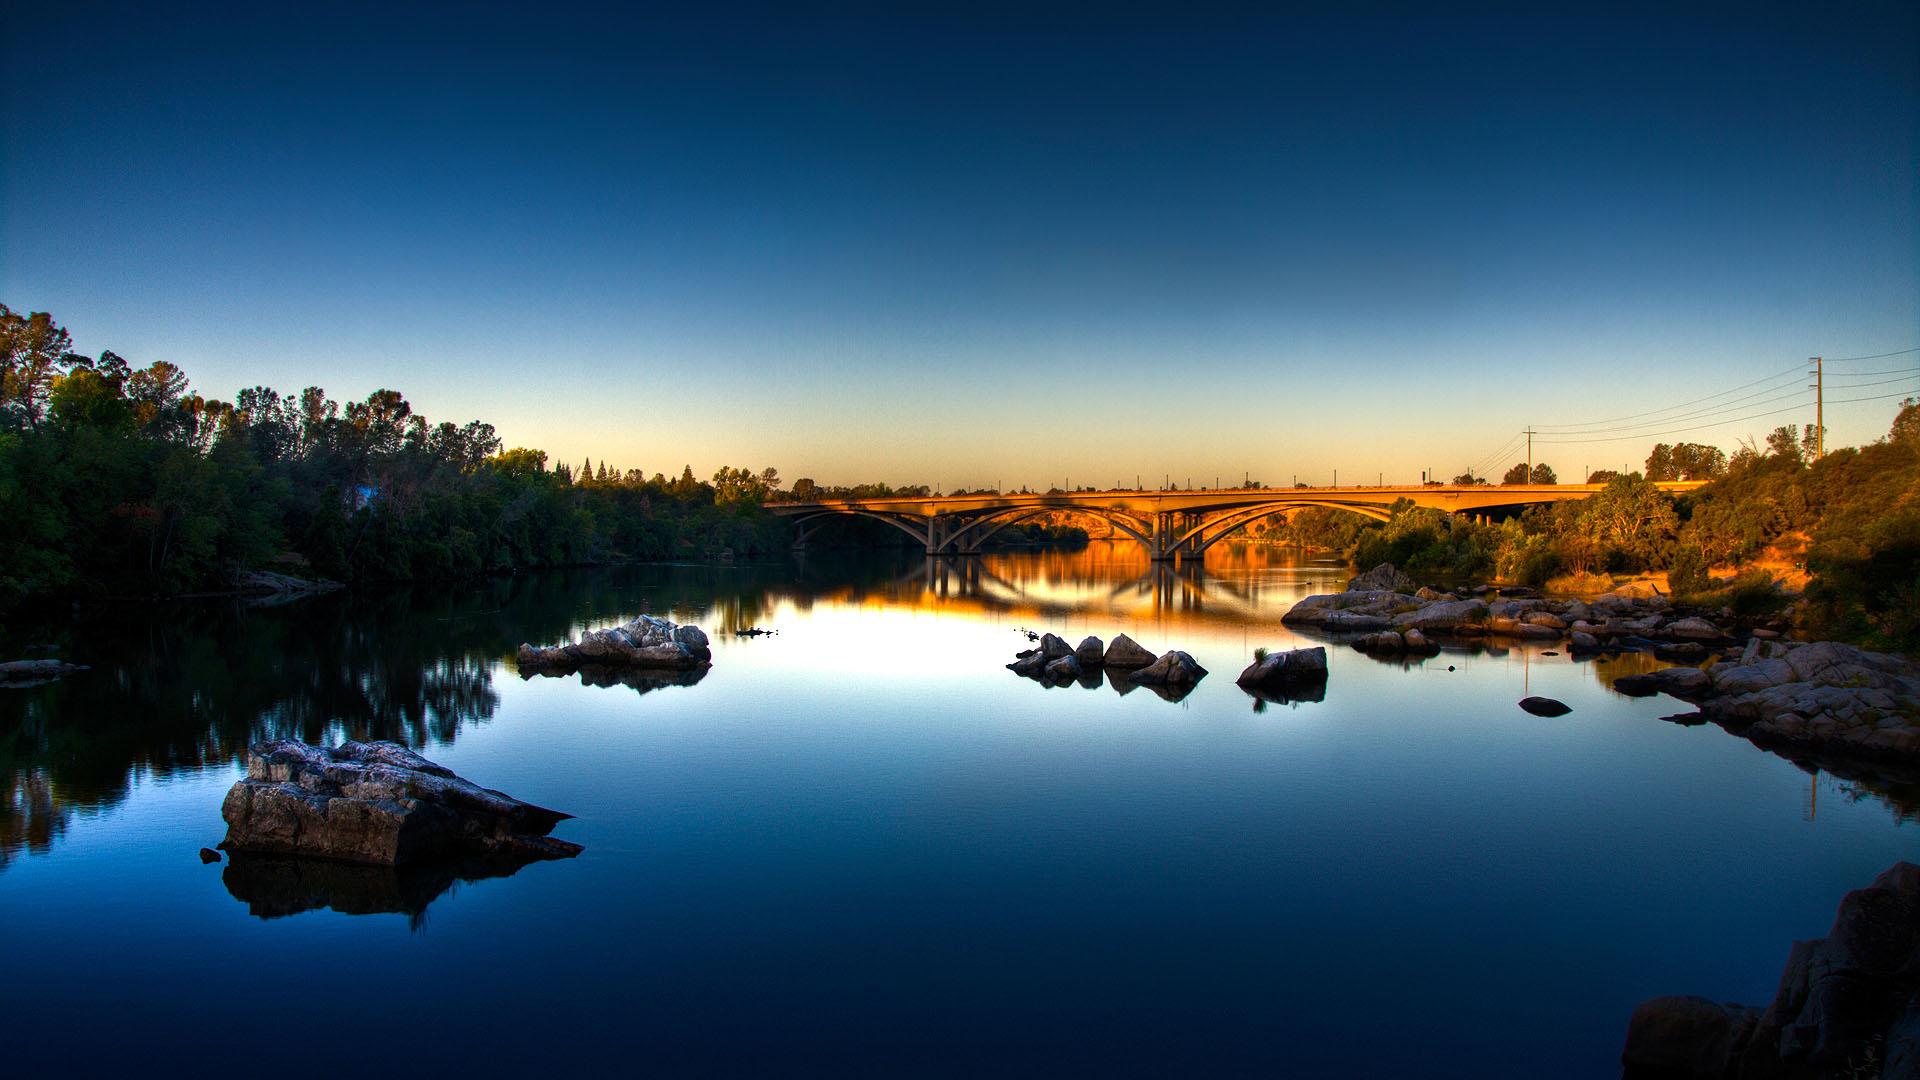 river wallpaper evening